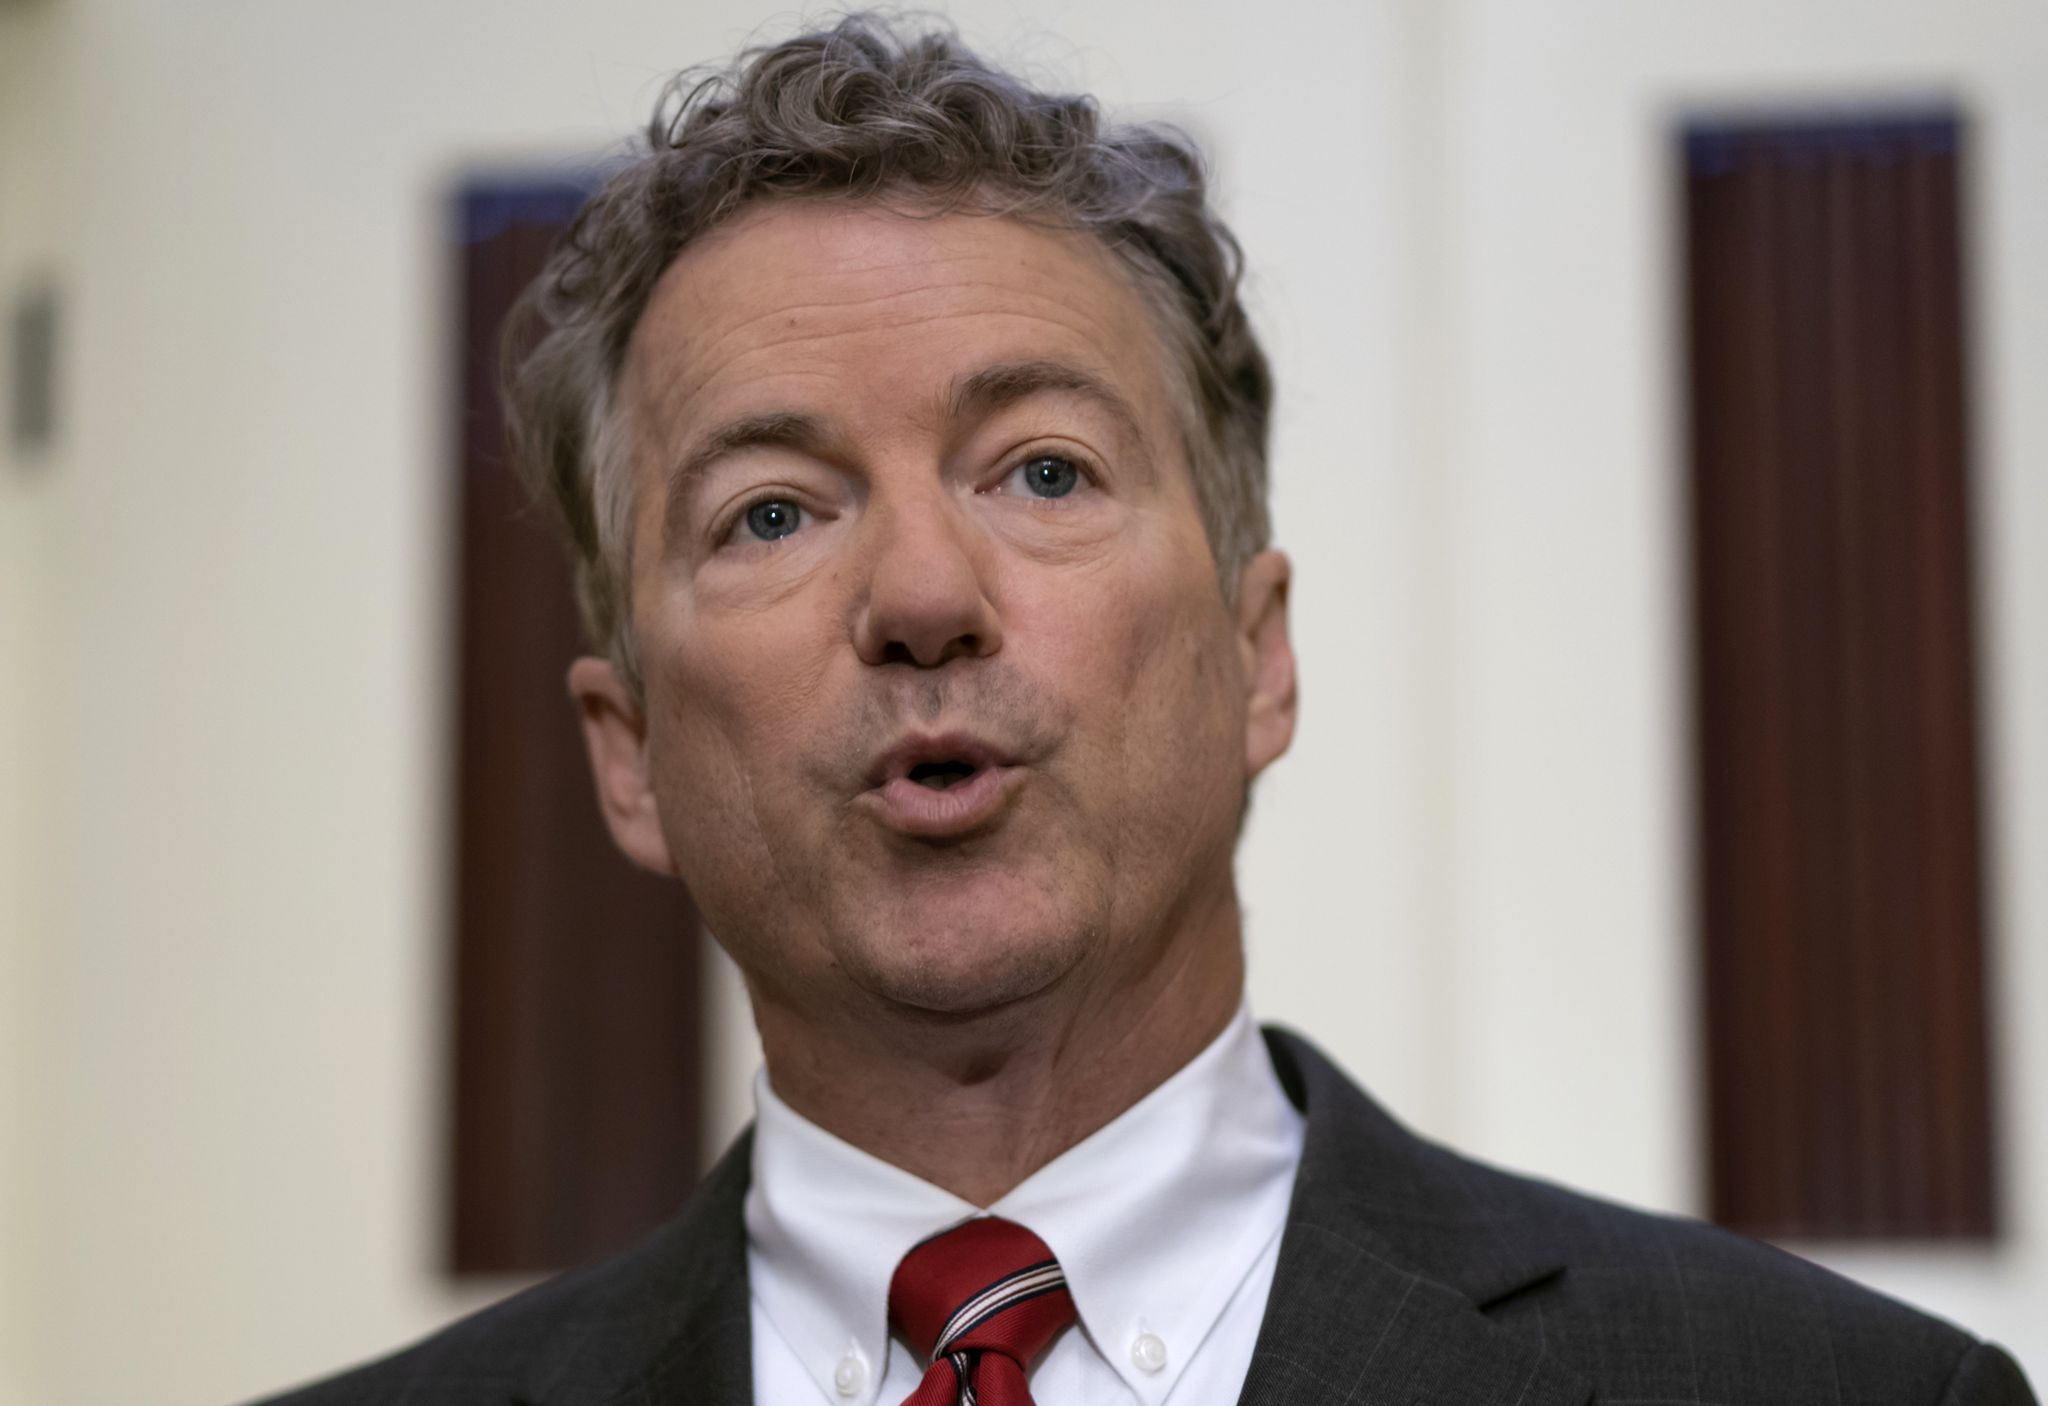 Rand Paul says Donald Trump summit critics 'mistaken,' suffer from 'Trump derangement syndrome'